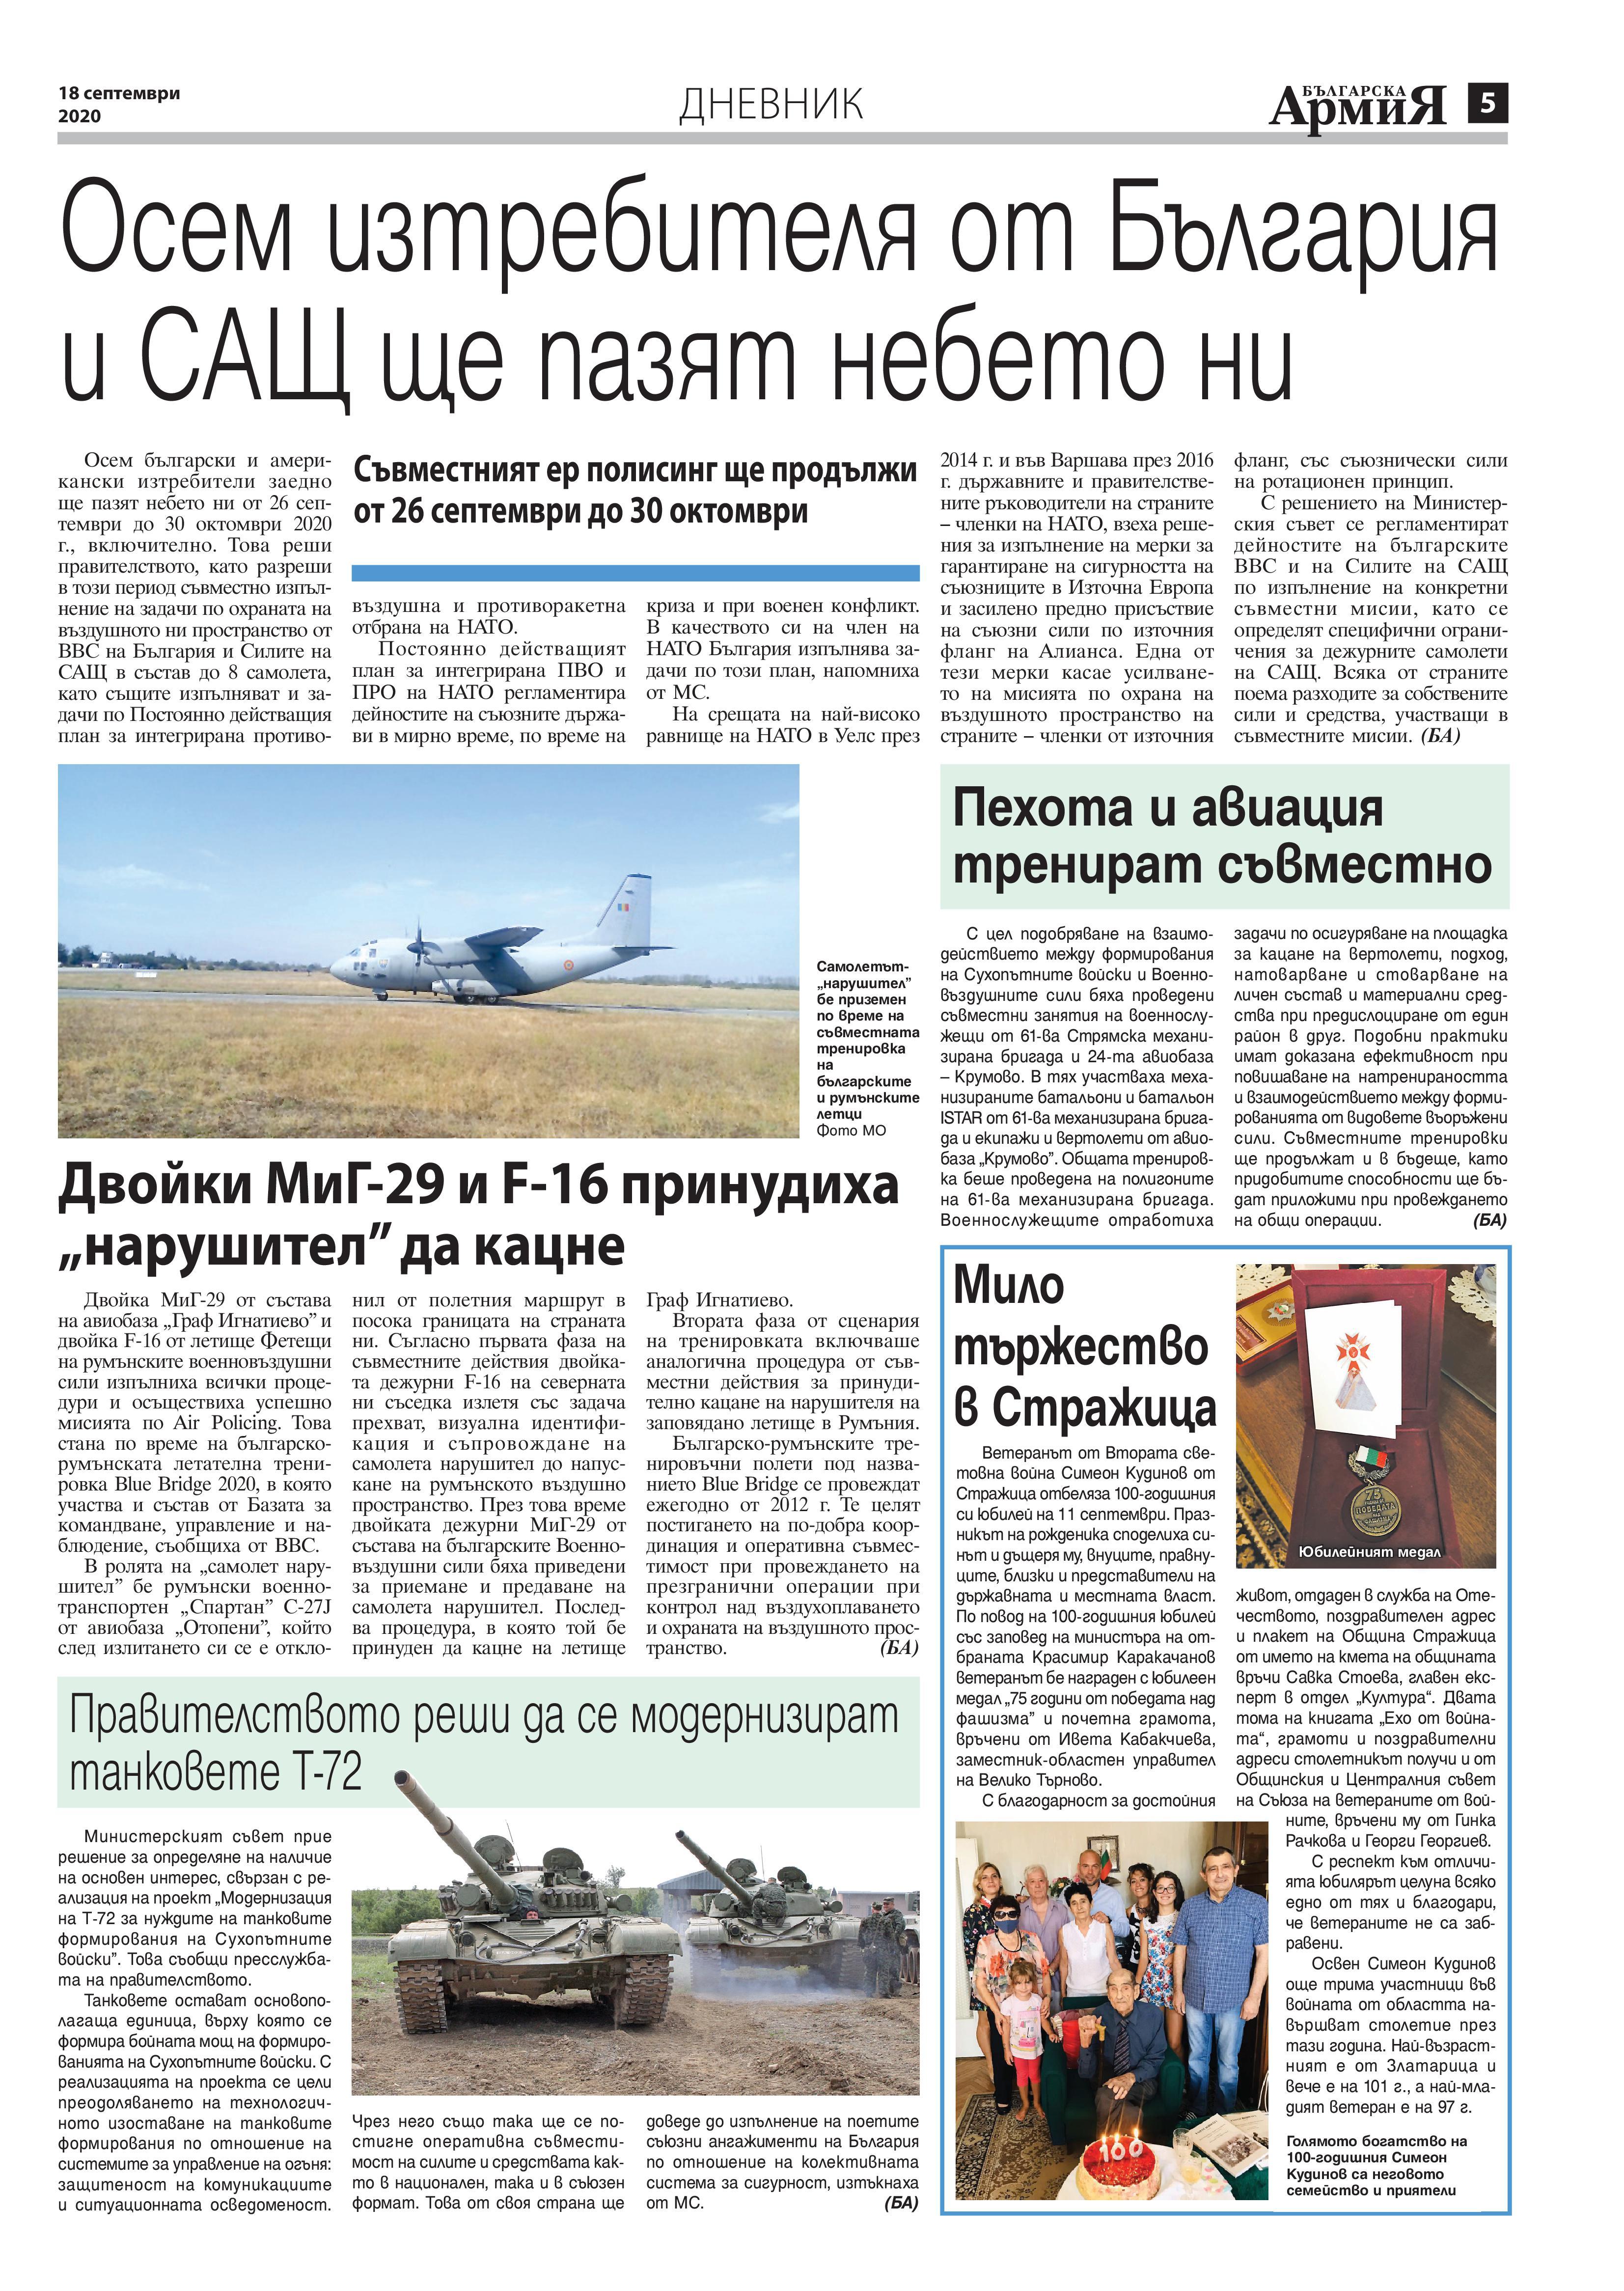 https://armymedia.bg/wp-content/uploads/2015/06/05-40.jpg